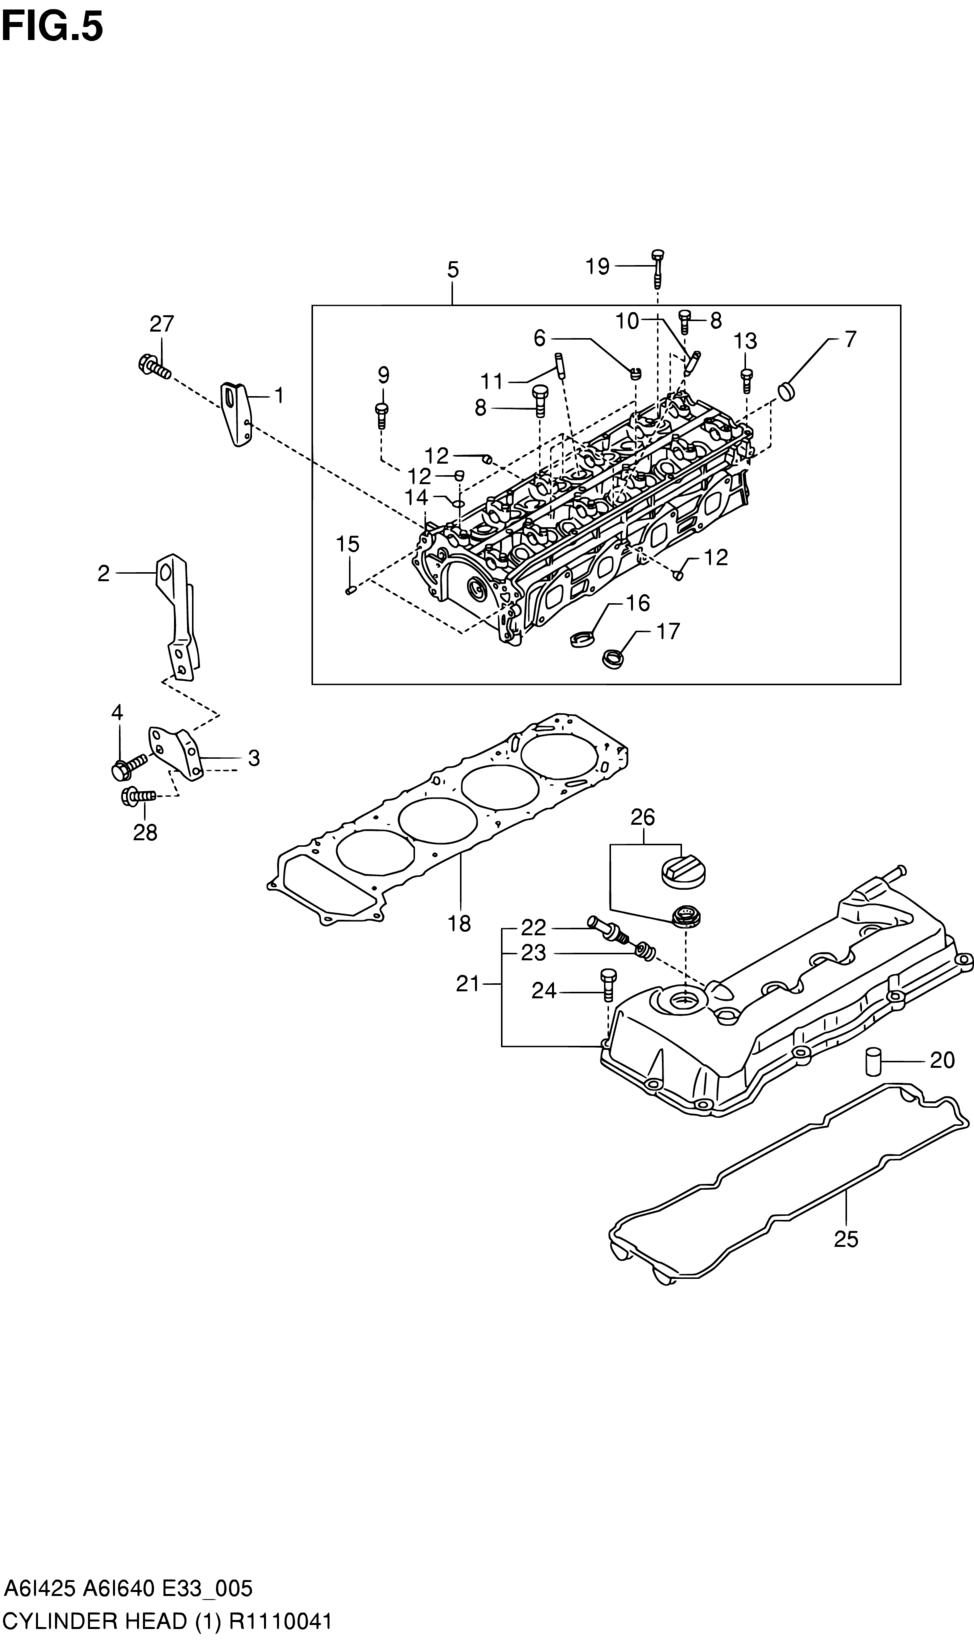 qr25de engine valve diagram wiring diagrams folder  qr25de engine valve diagram #2